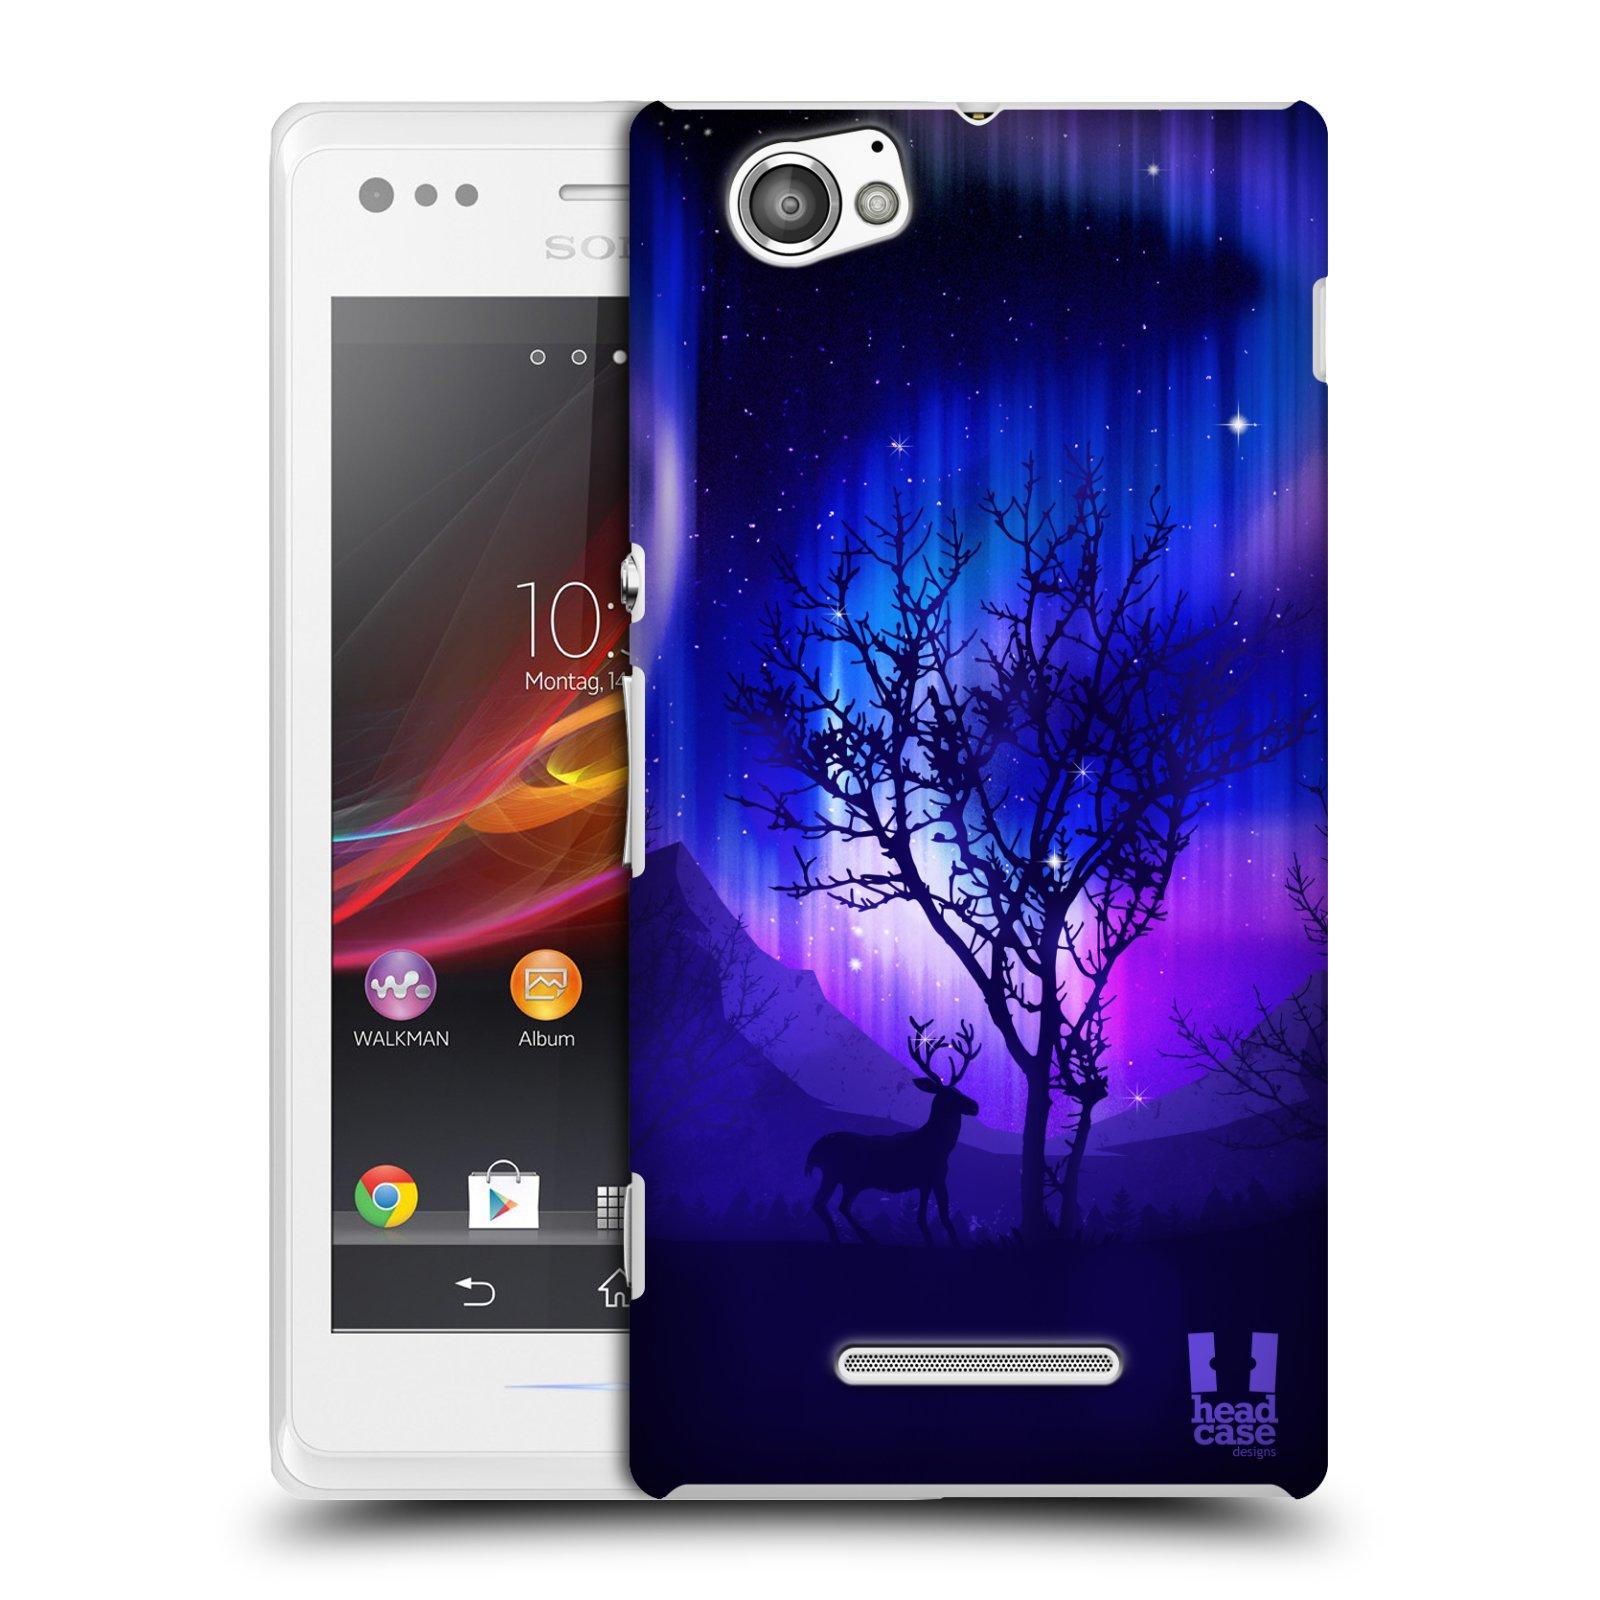 Plastové pouzdro na mobil Sony Xperia M C1905 HEAD CASE Polární Záře Strom (Kryt či obal na mobilní telefon Sony Xperia M )